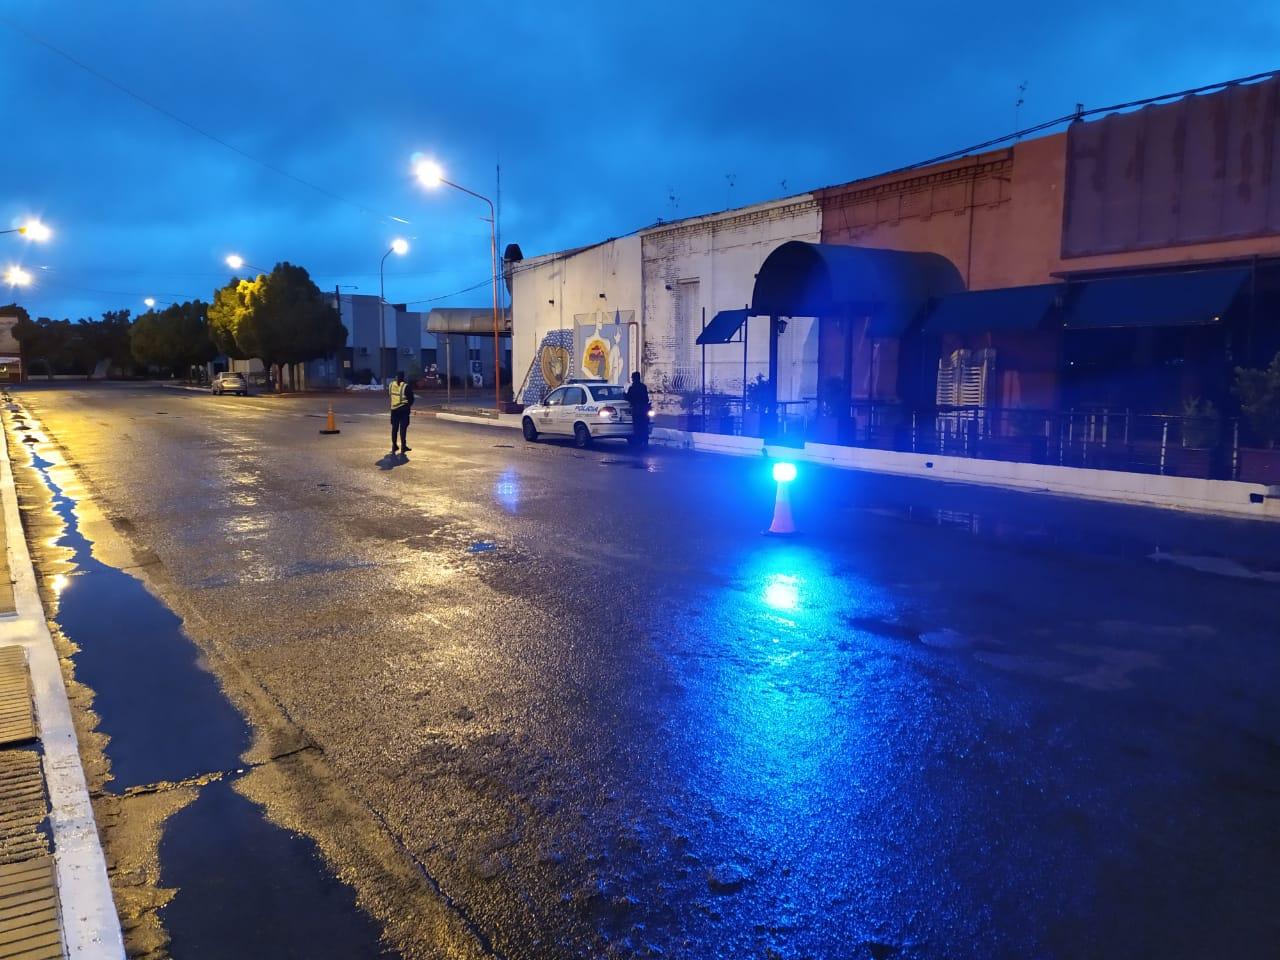 Controles nocturnos en Eduardo Castex: de 12 alcohotest, 5 dieron positivo